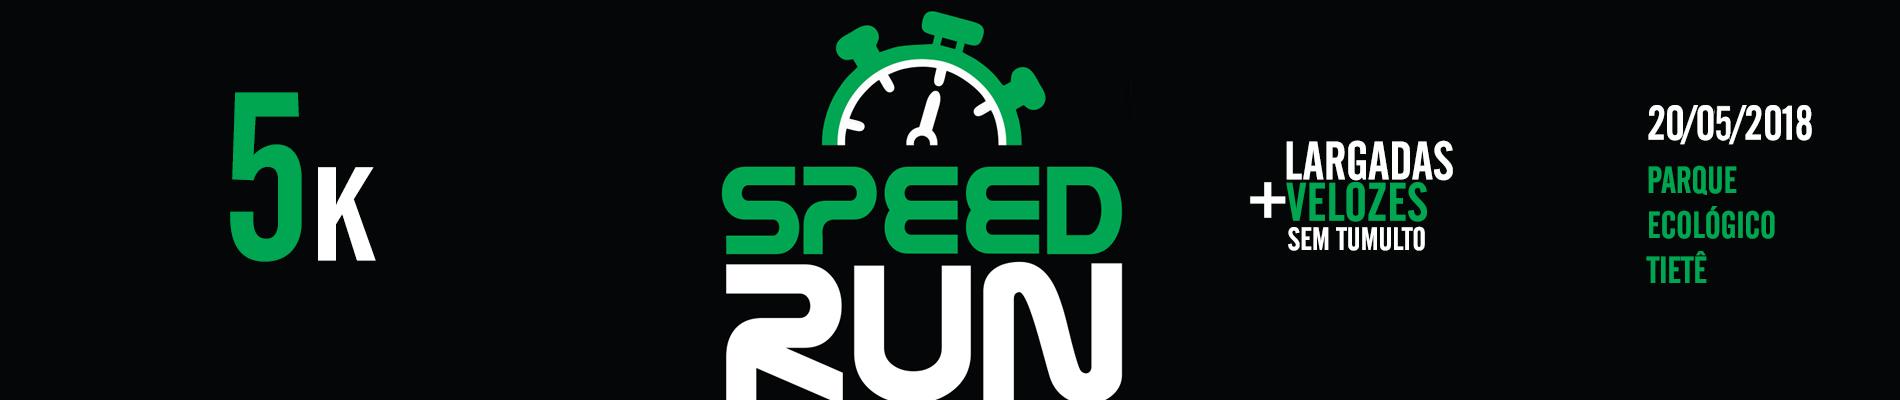 SPEED RUN - Imagem de topo